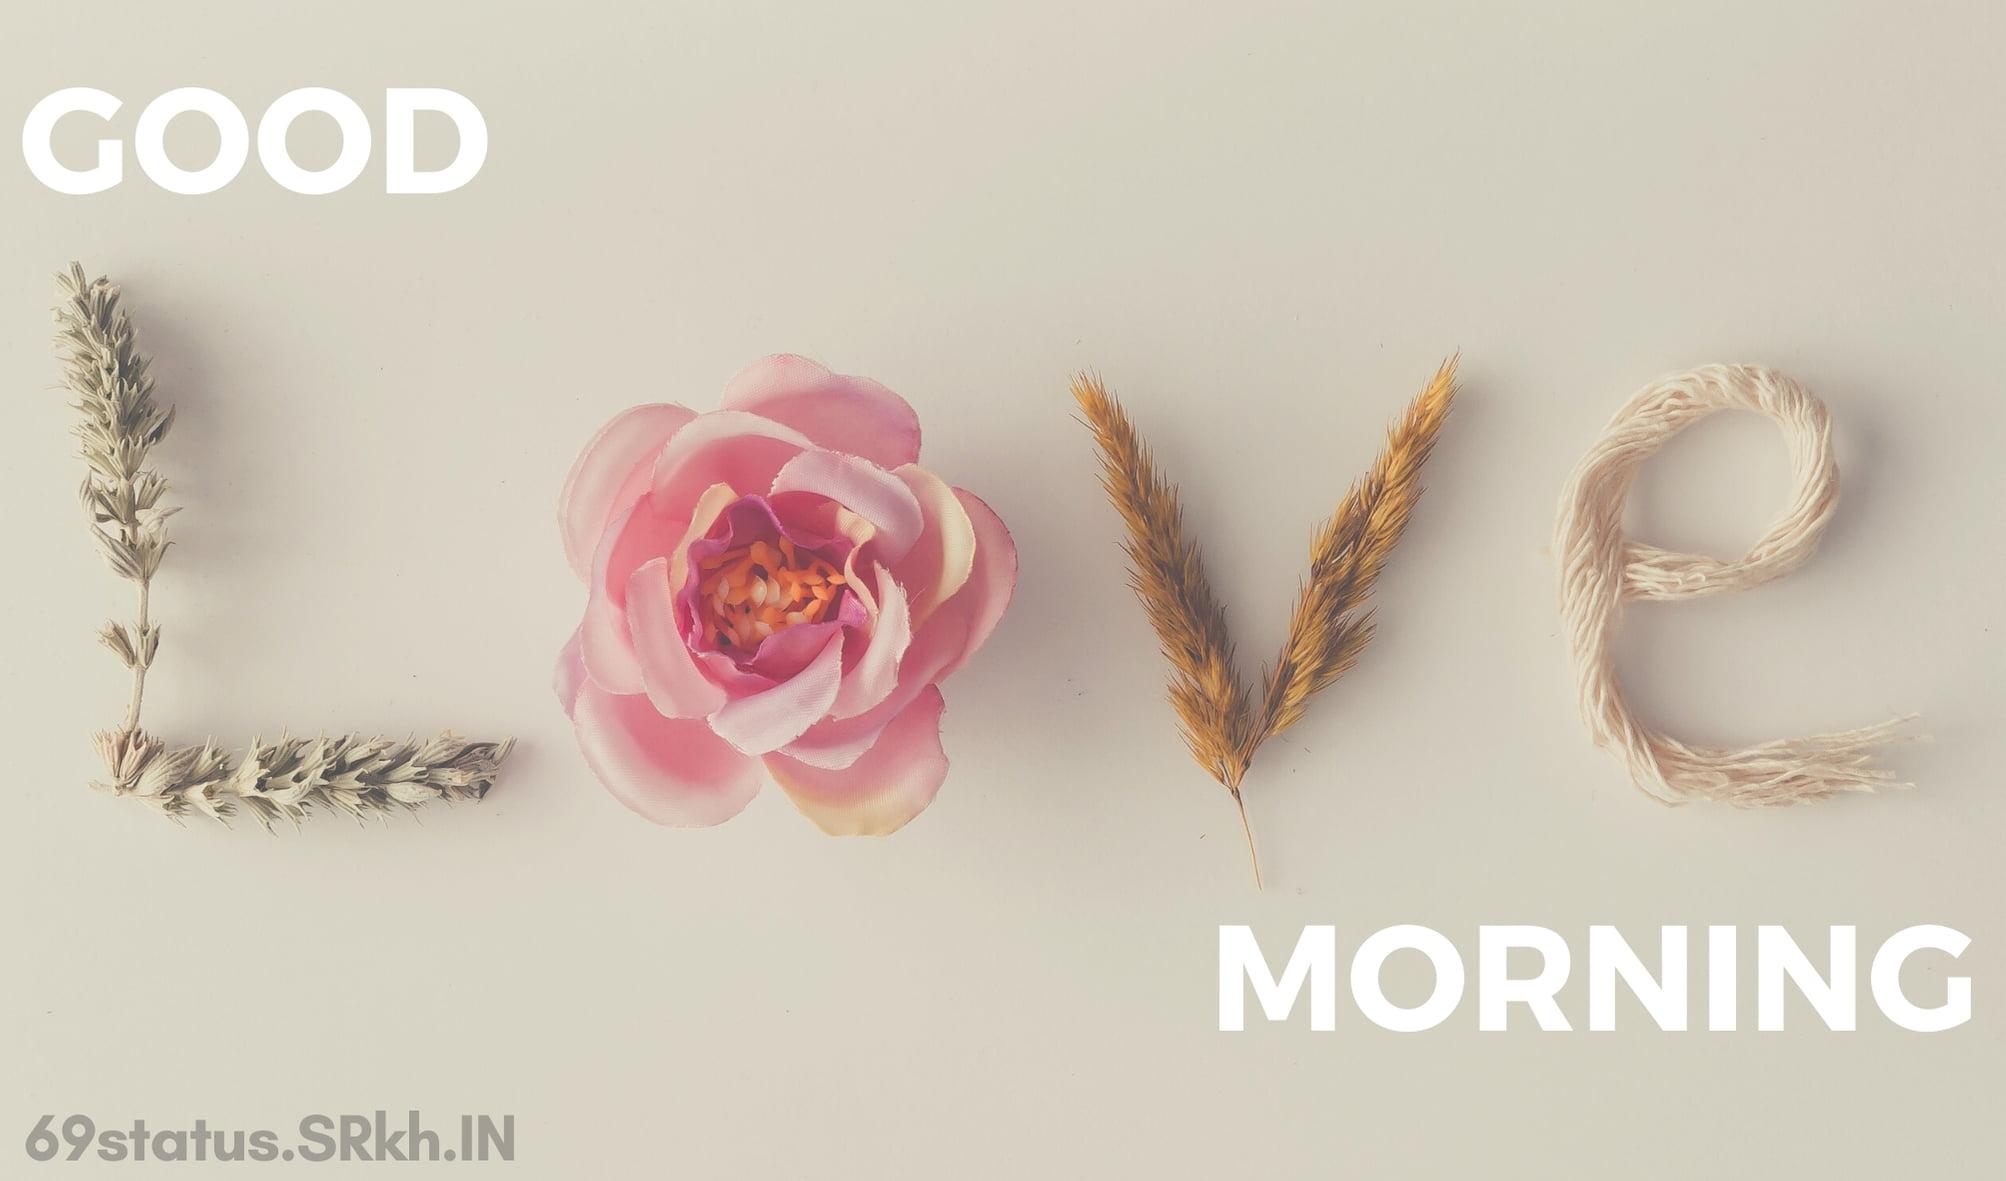 Good Morning Romantic Love Rose Image full HD free download.